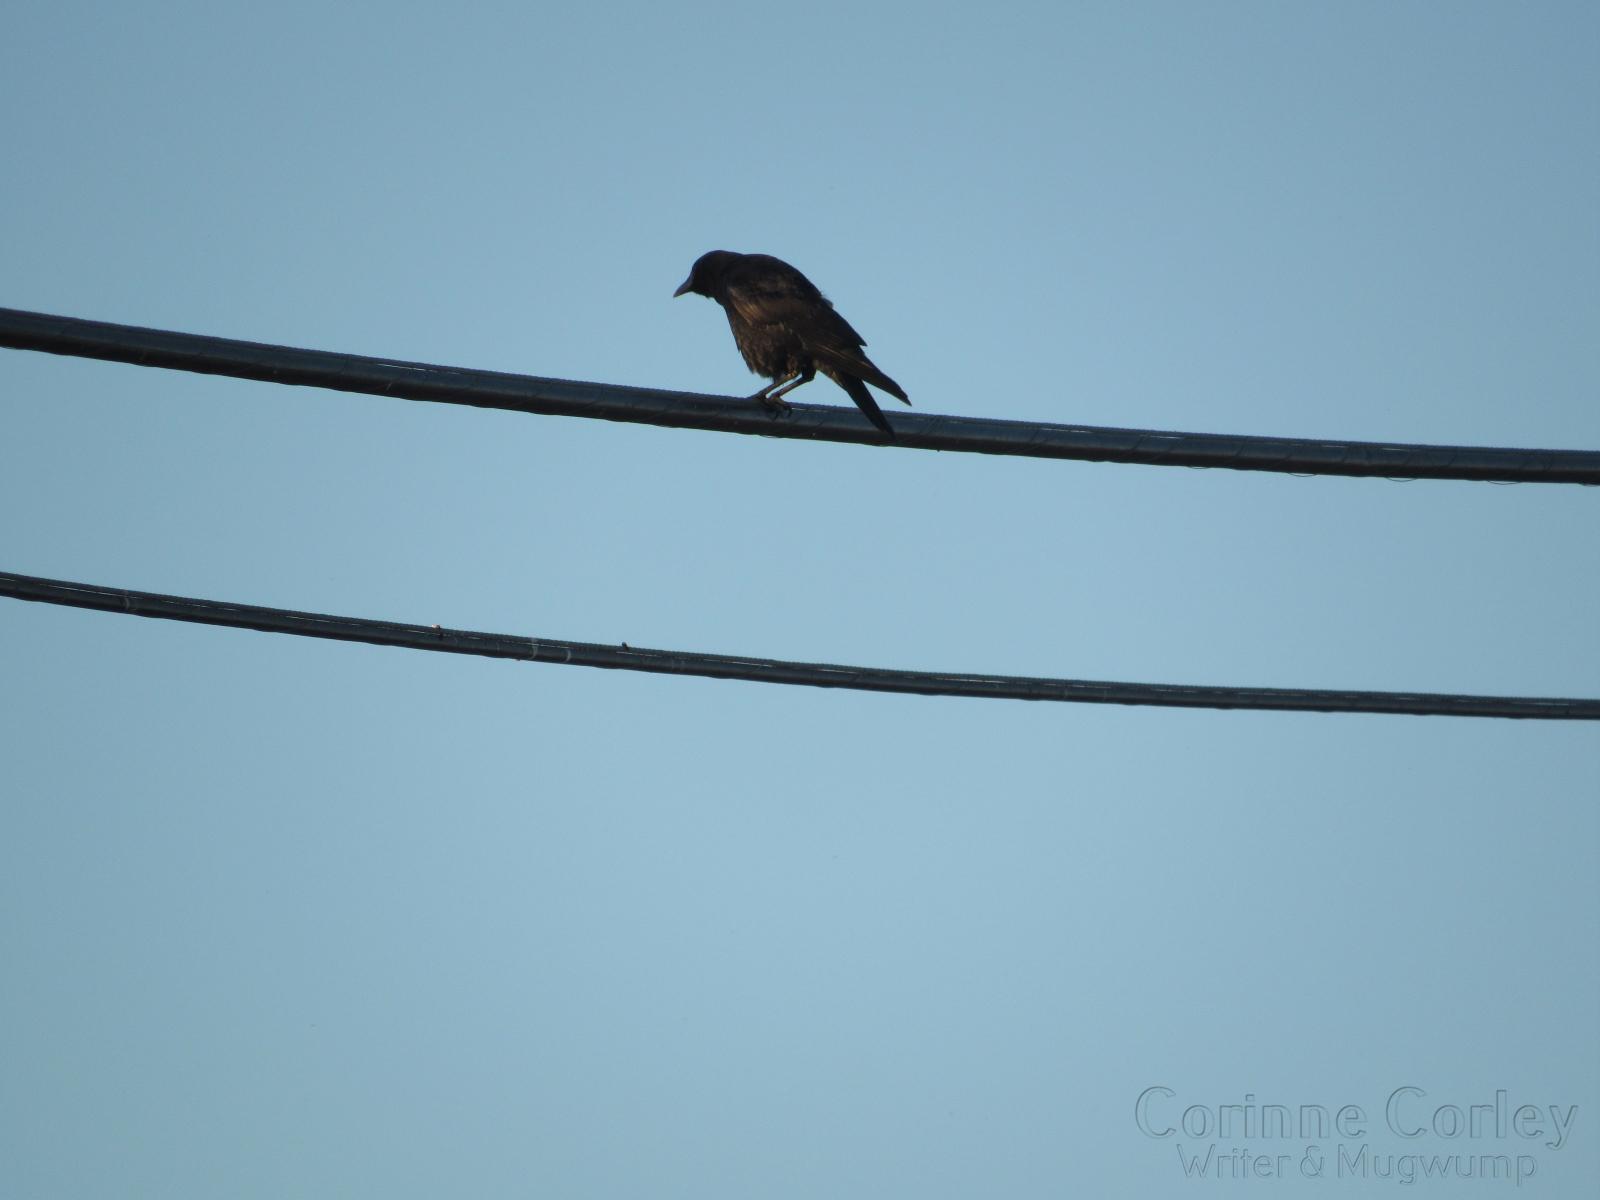 Blackbird-in-the-blue-sky